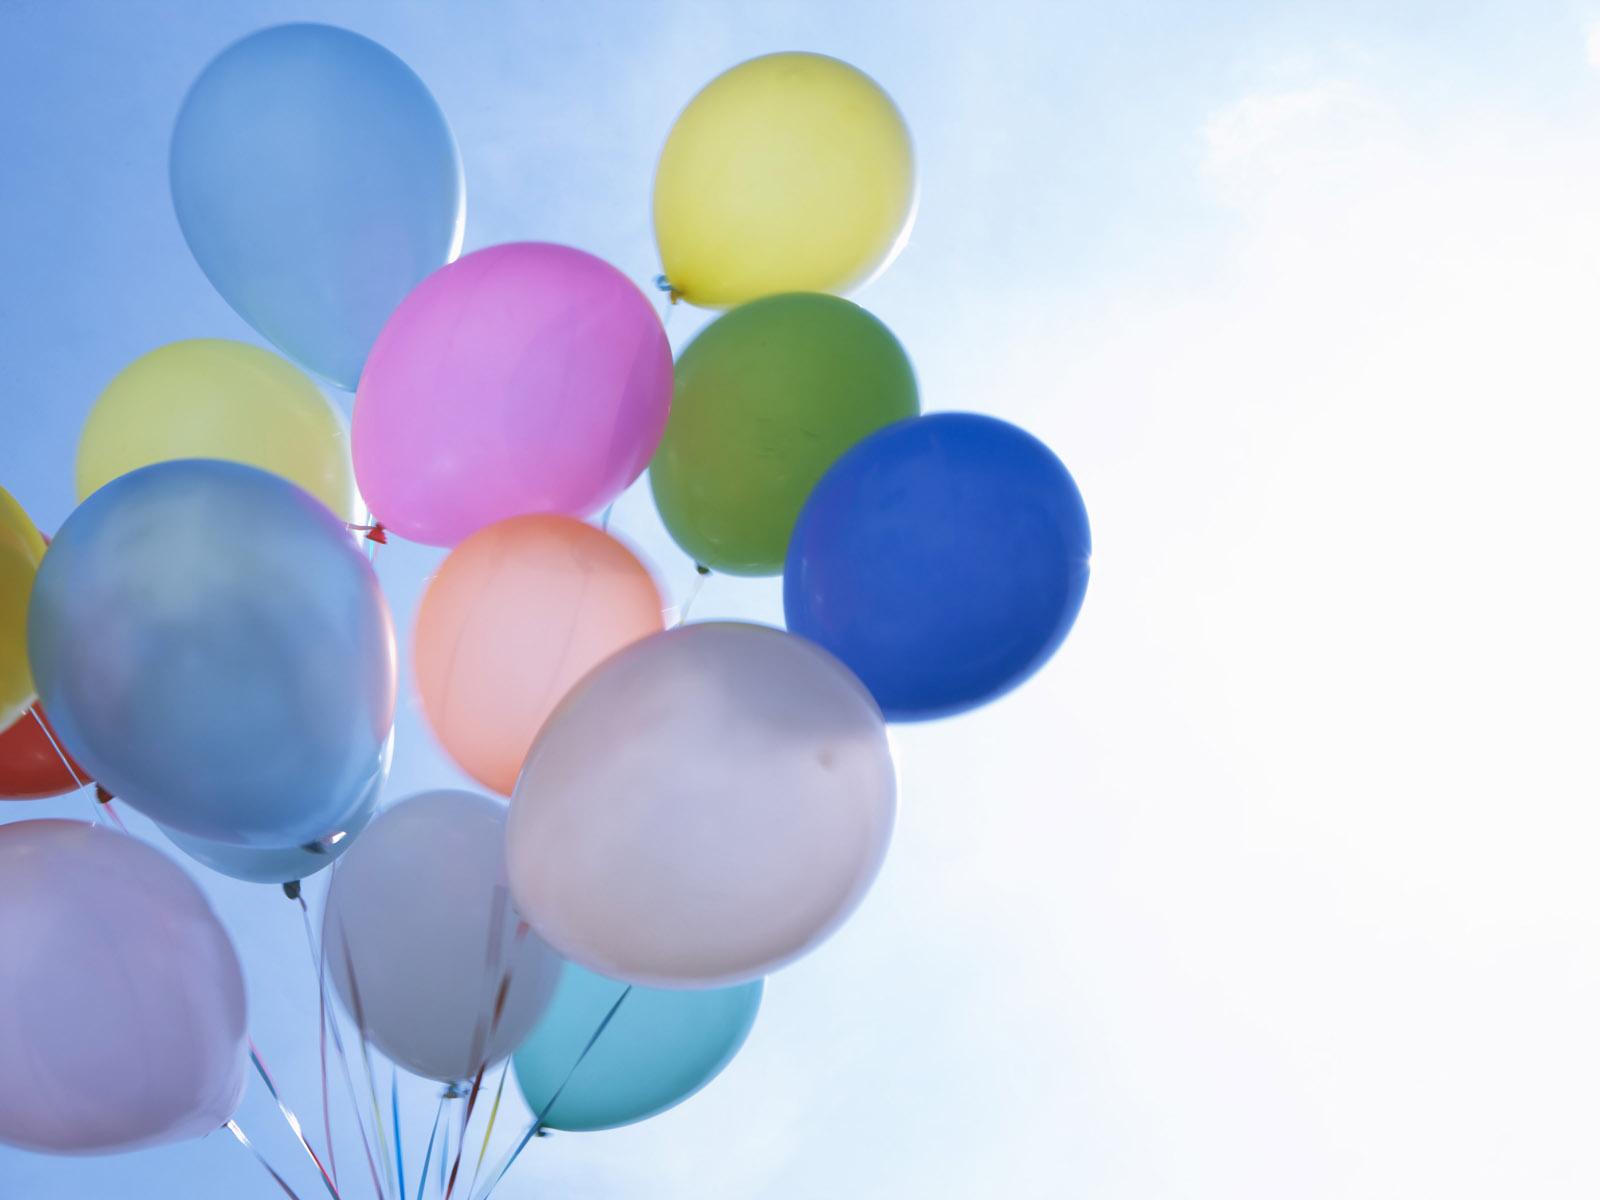 Birthday balloon backgrounds 1600x1200